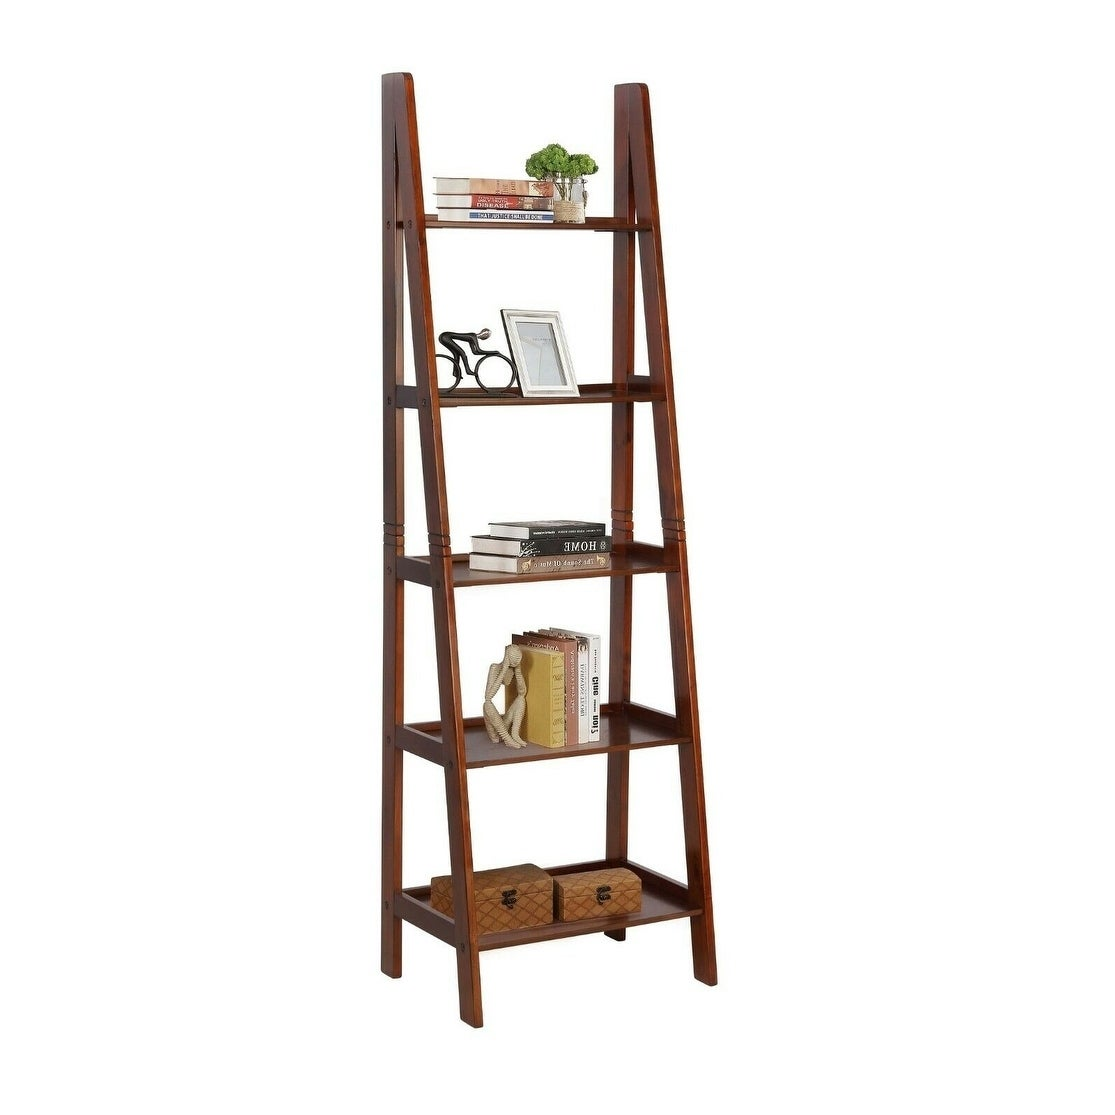 Wall Shelf Ladder Cherry Wood Bookshelf